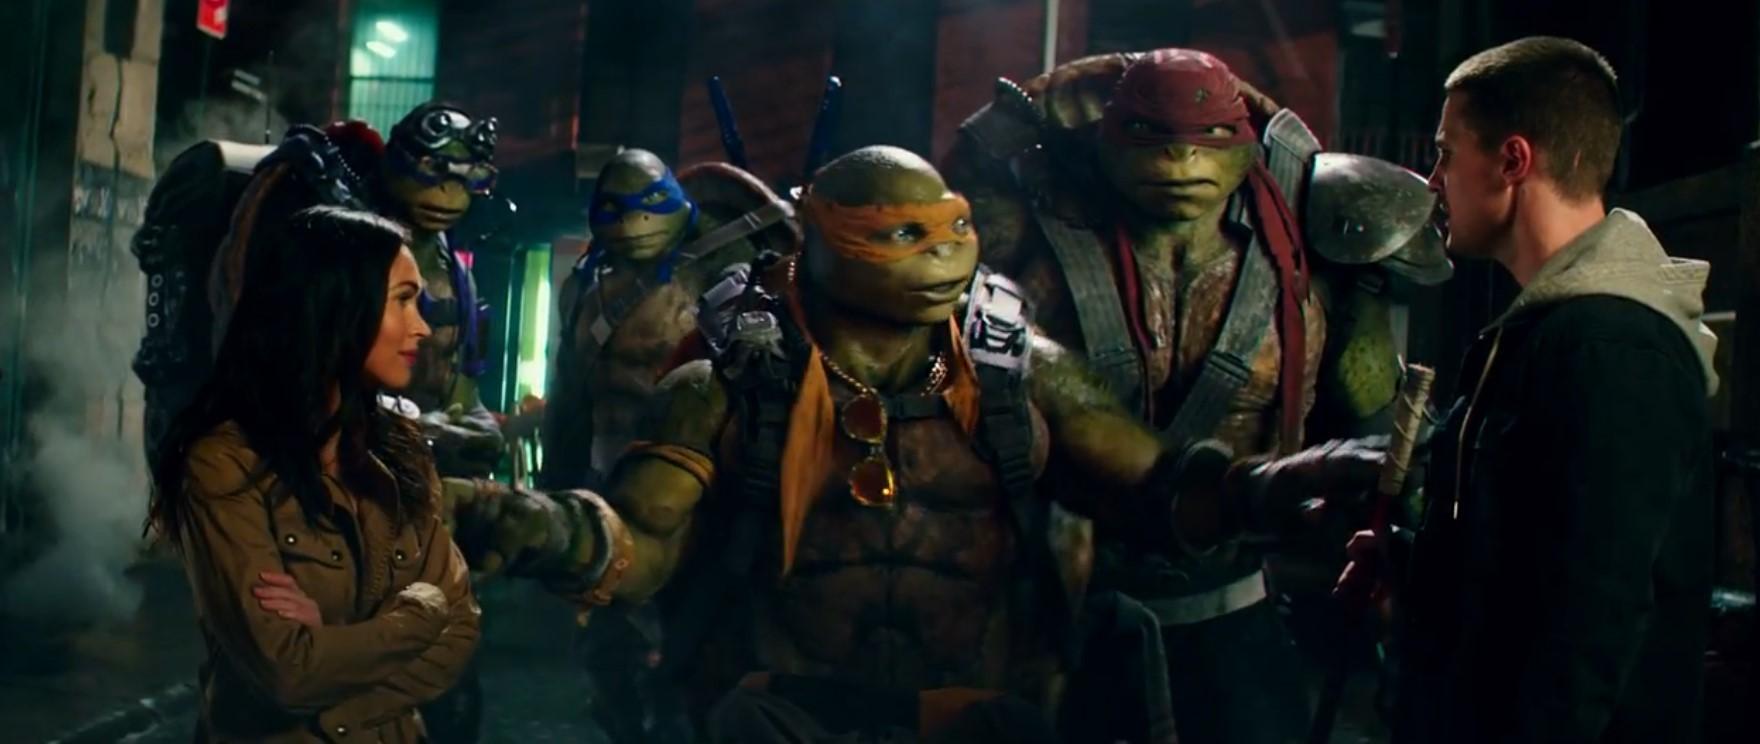 Noel Fisher, Jeremy Howard, Megan Fox, Stephen Amell, Alan Ritchson, and Pete Ploszek in Teenage Mutant Ninja Turtles: Out of the Shadows (2016)